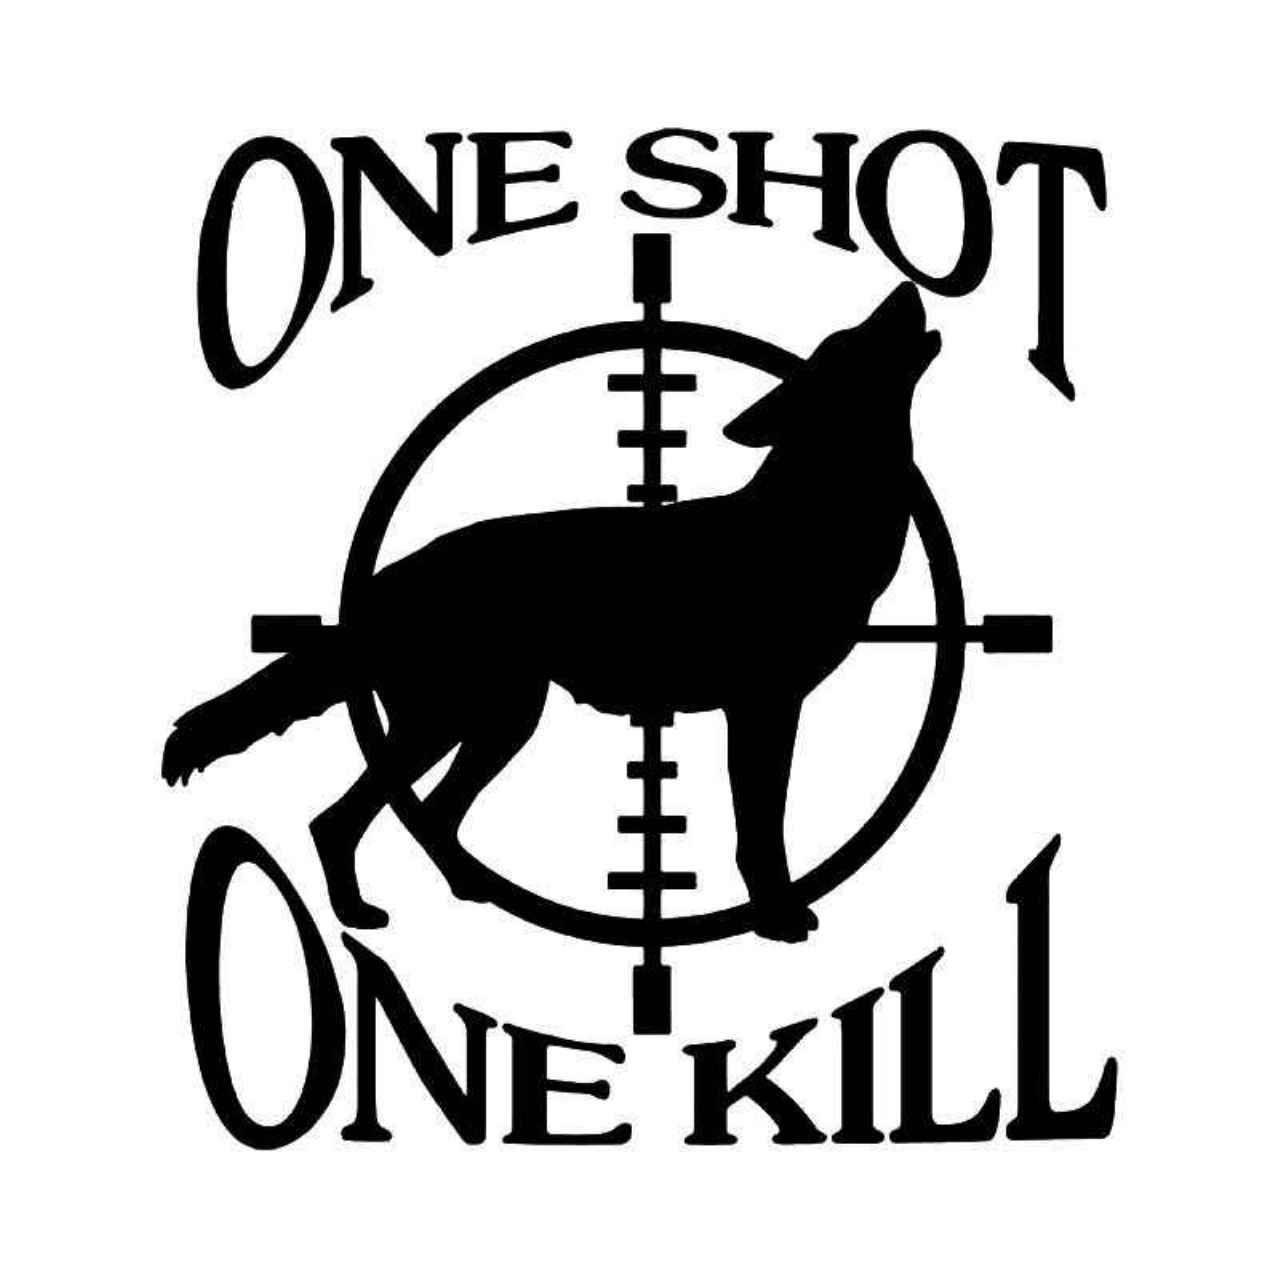 Sniper Crosshairs Wolf Kill Hunting Vinyl Decal Sticker